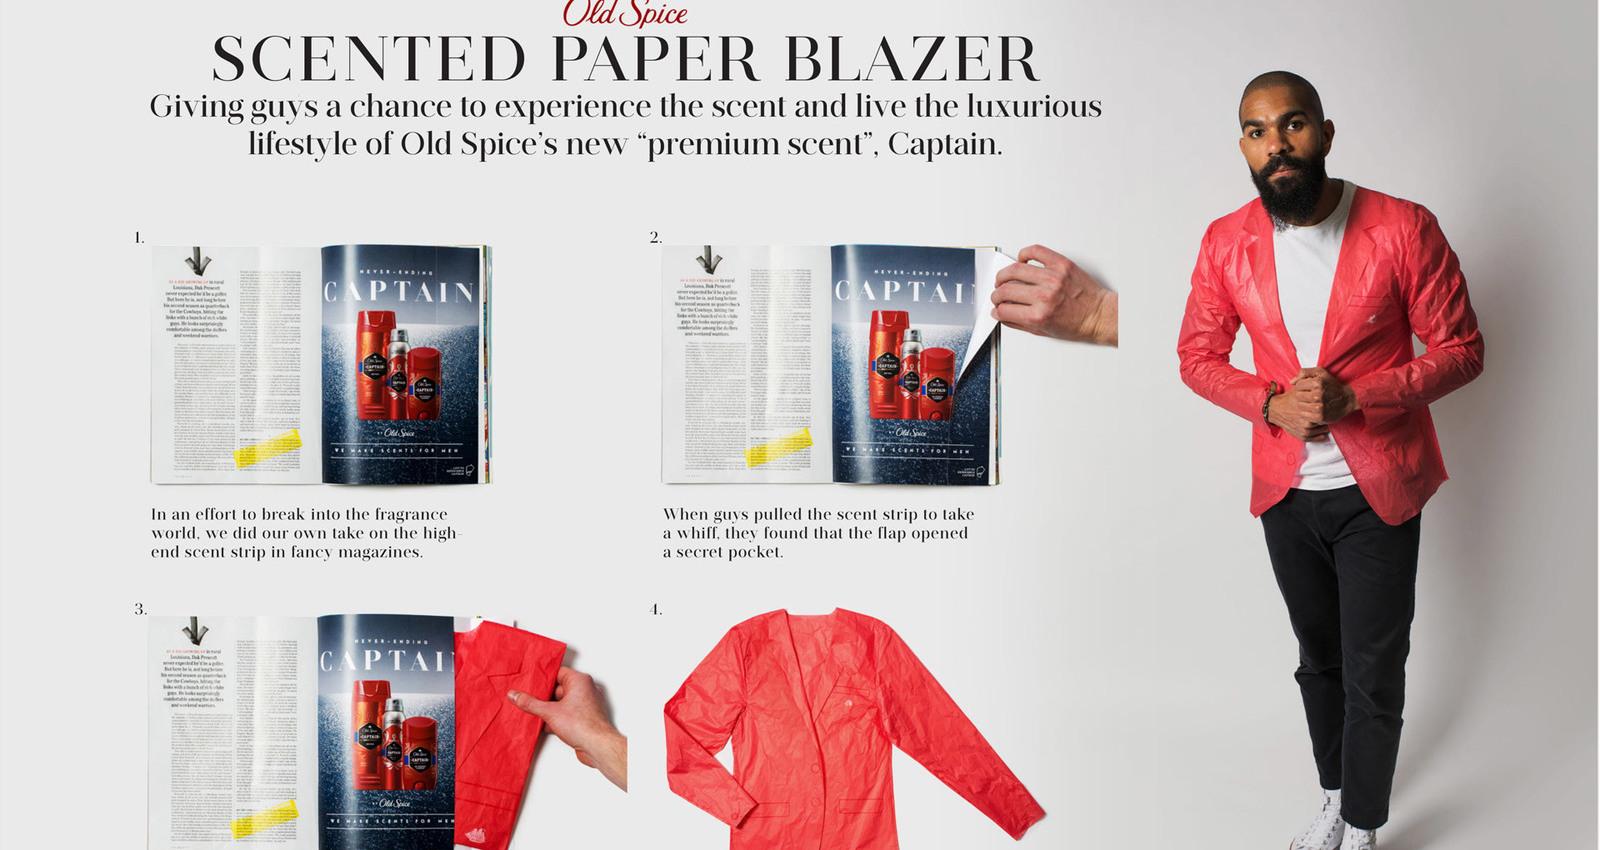 Old Spice - Paper Blazer